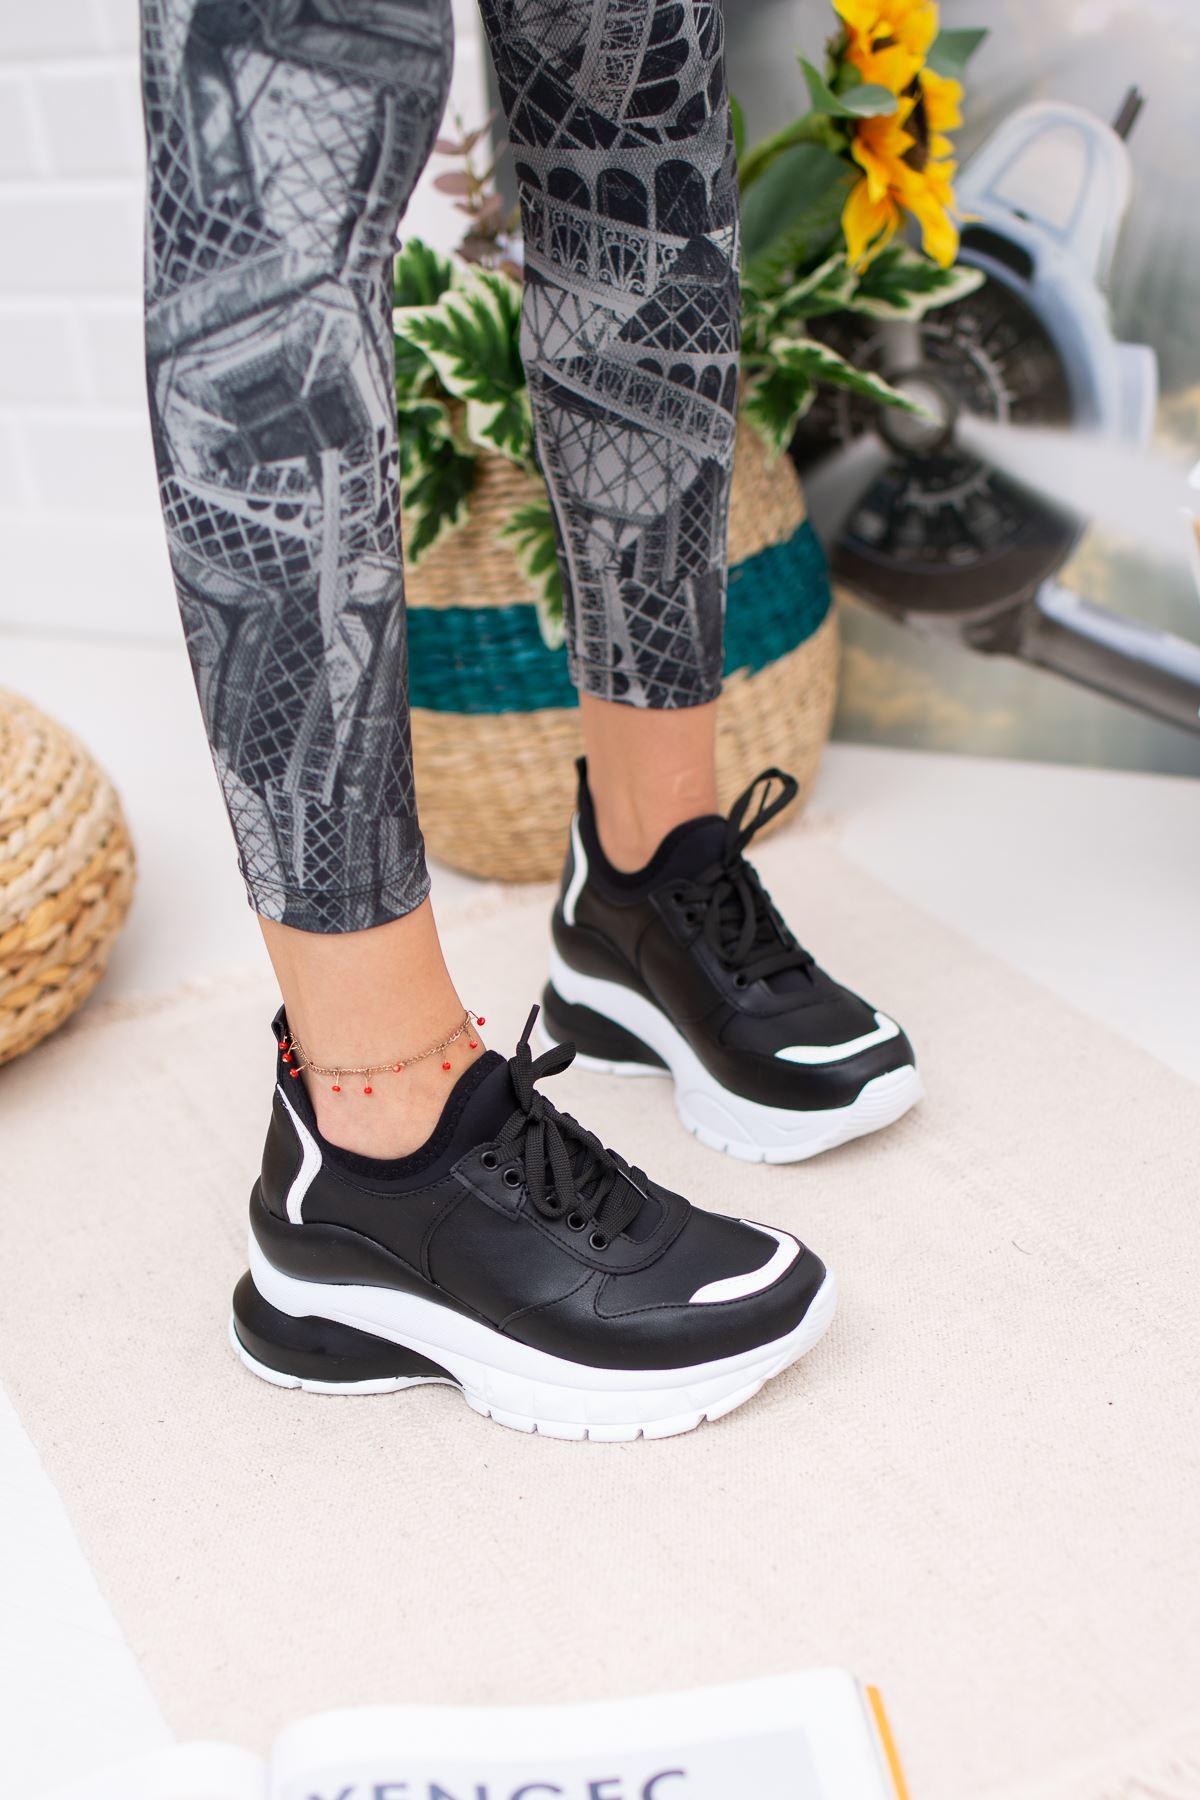 Kayke Siyah Ortapedik Bayan Spor Ayakkabı